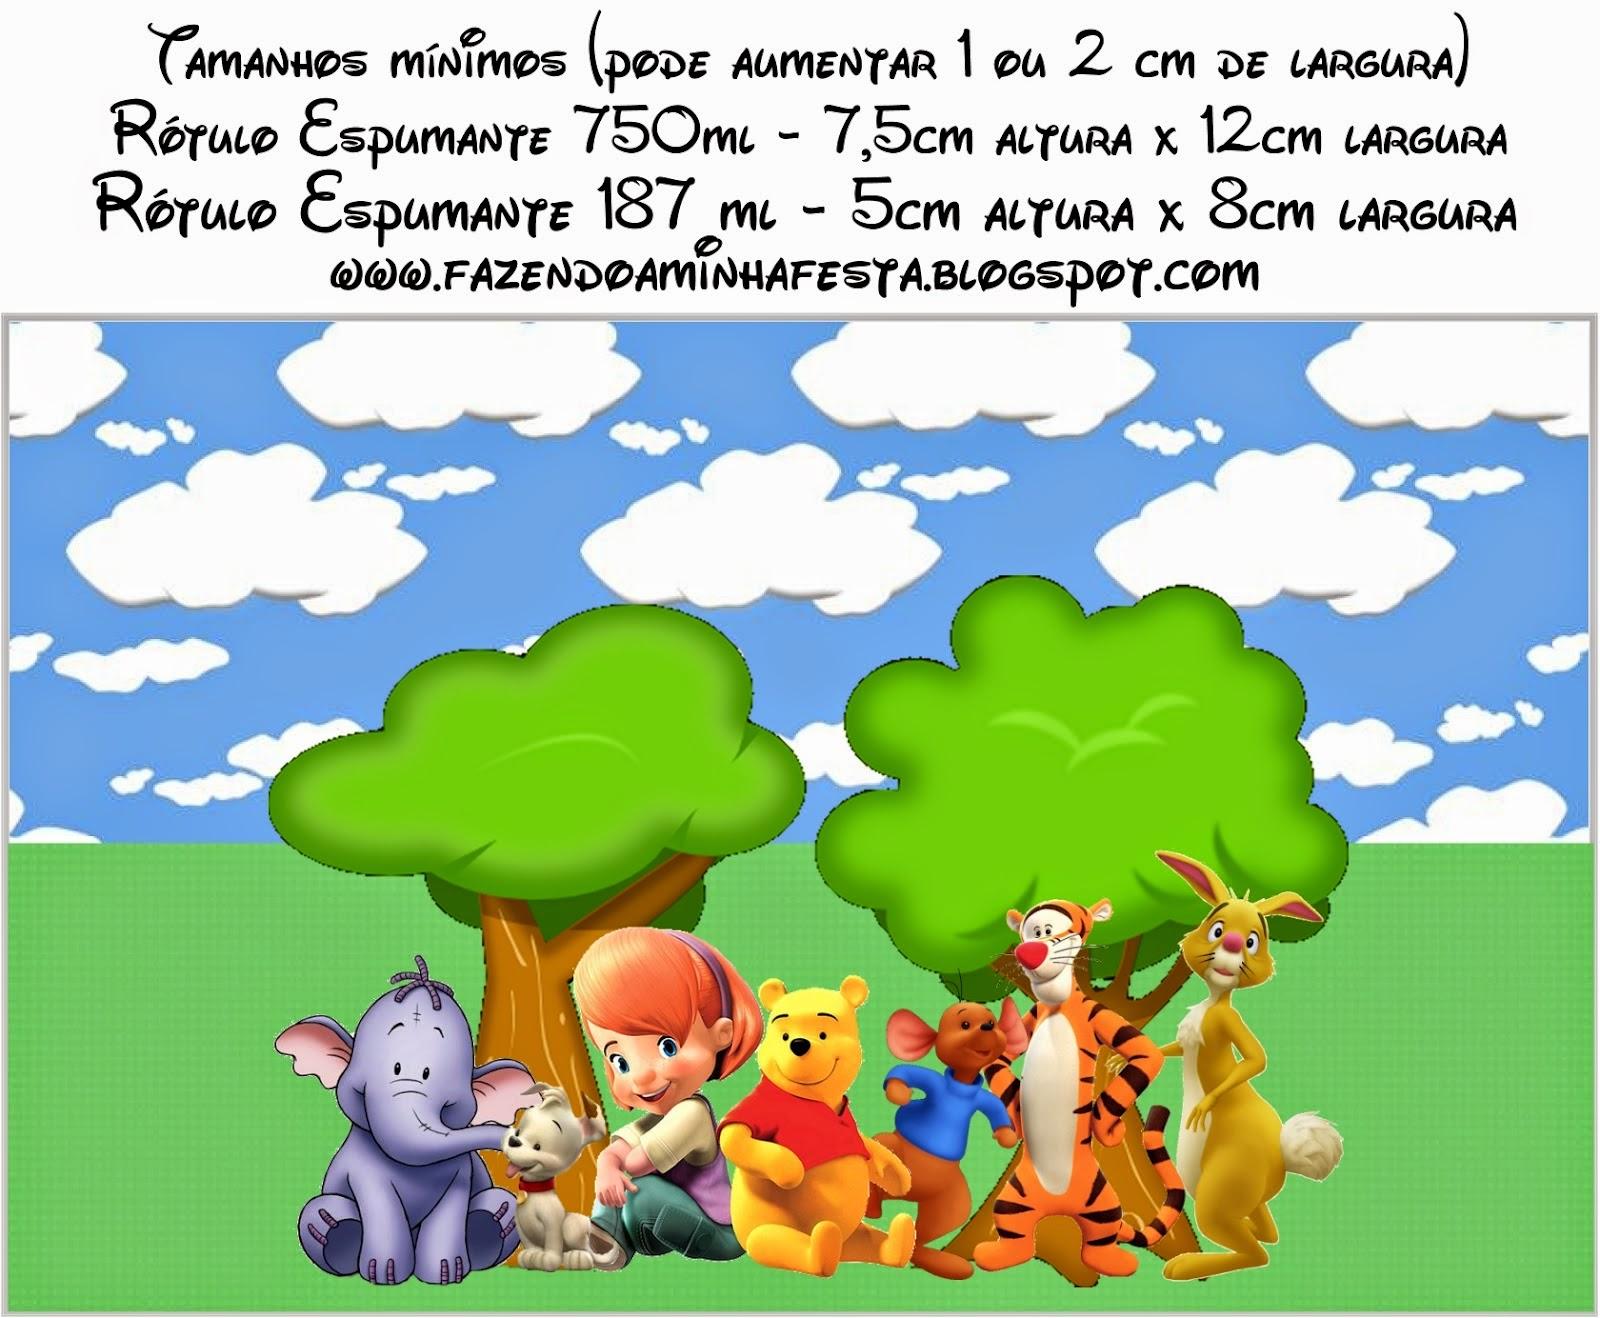 Winnie the Pooh: Etiquetas Candy Bar para Imprimir Gratis. | Oh My Bebé!